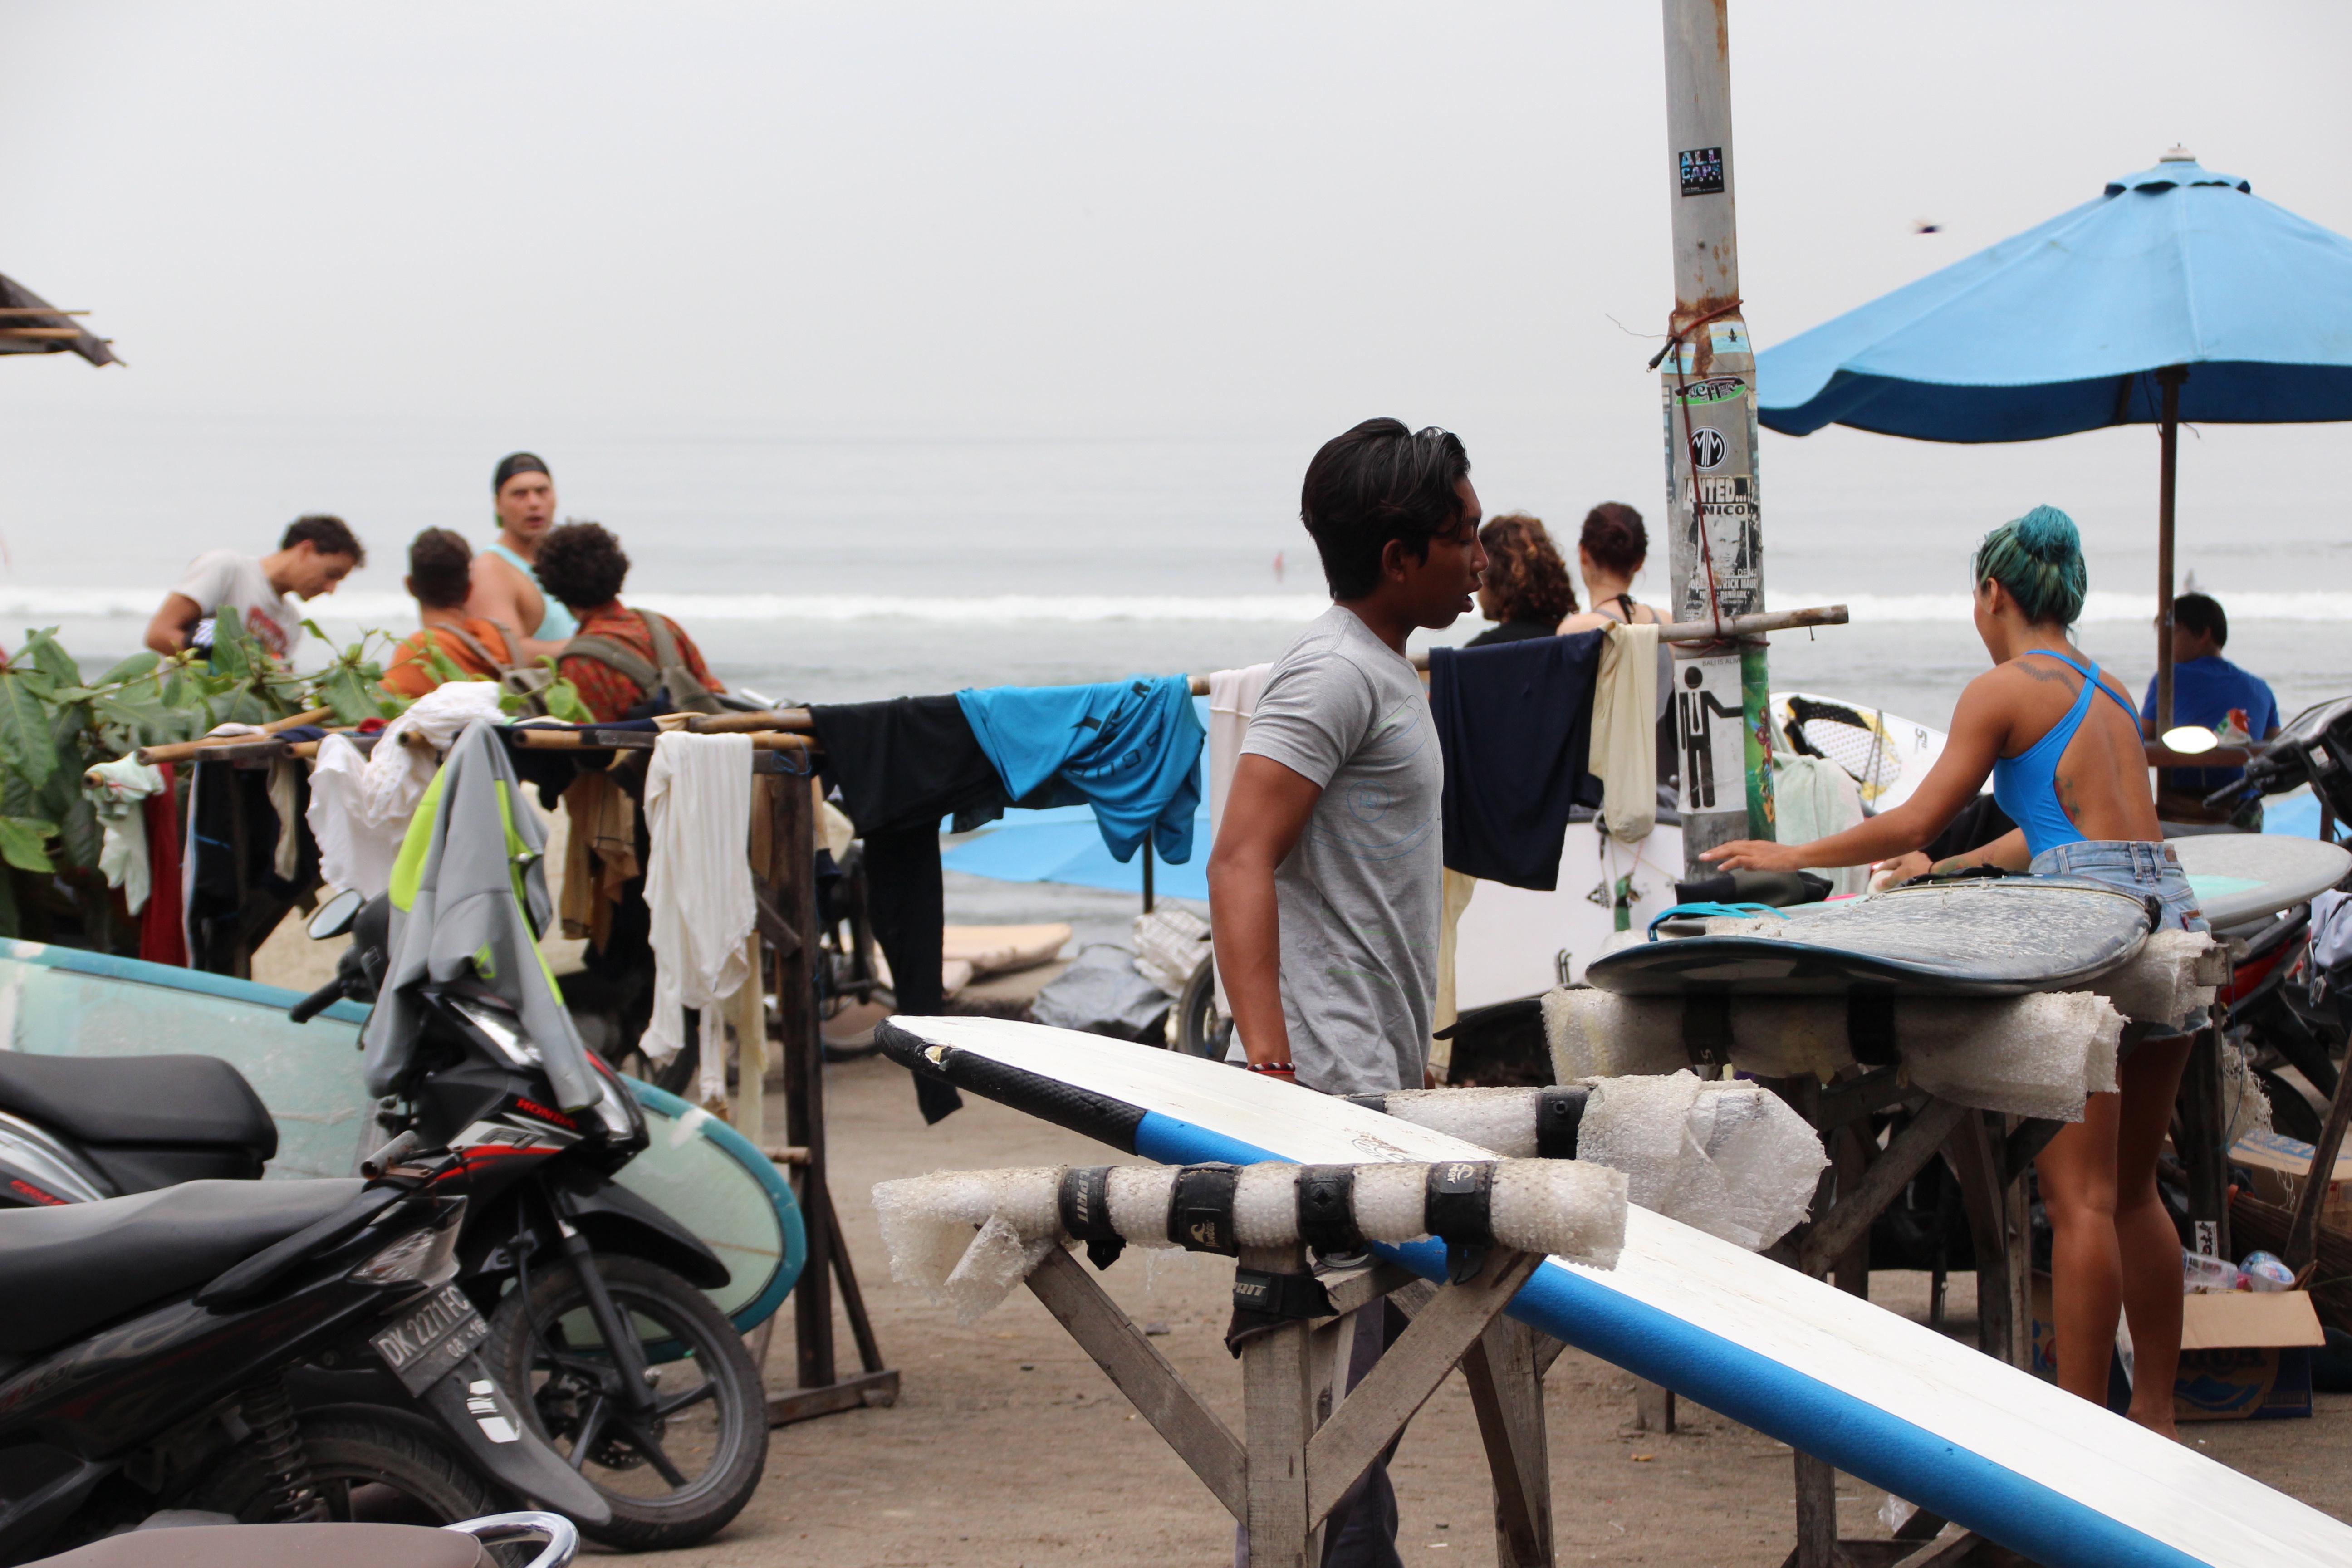 Bali surf 4 | Eat.Pure.Love